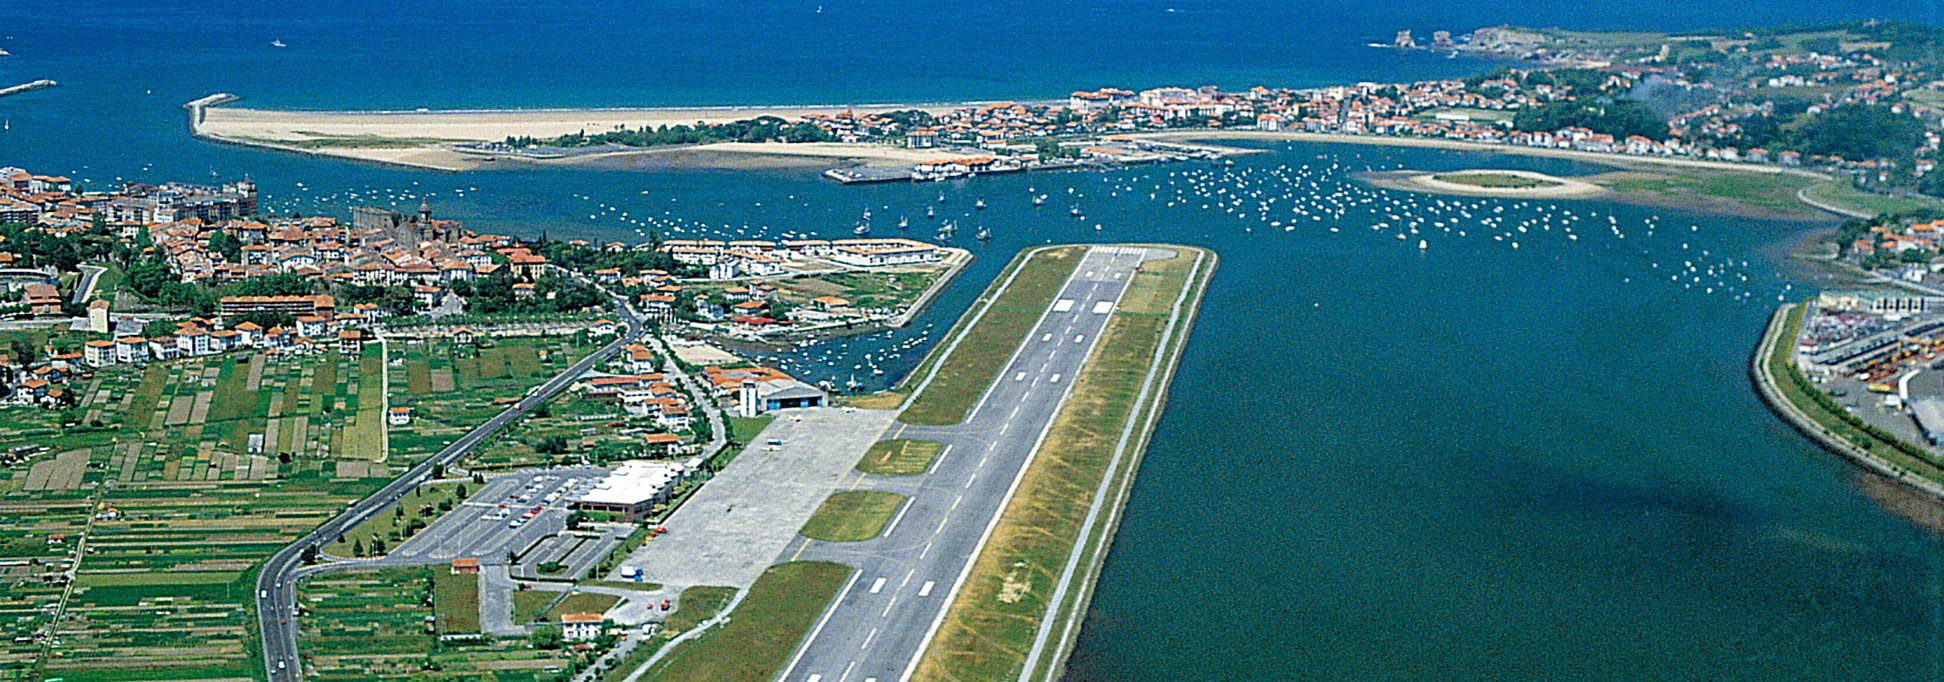 Airports around the World - IATA code: E - Nations Online